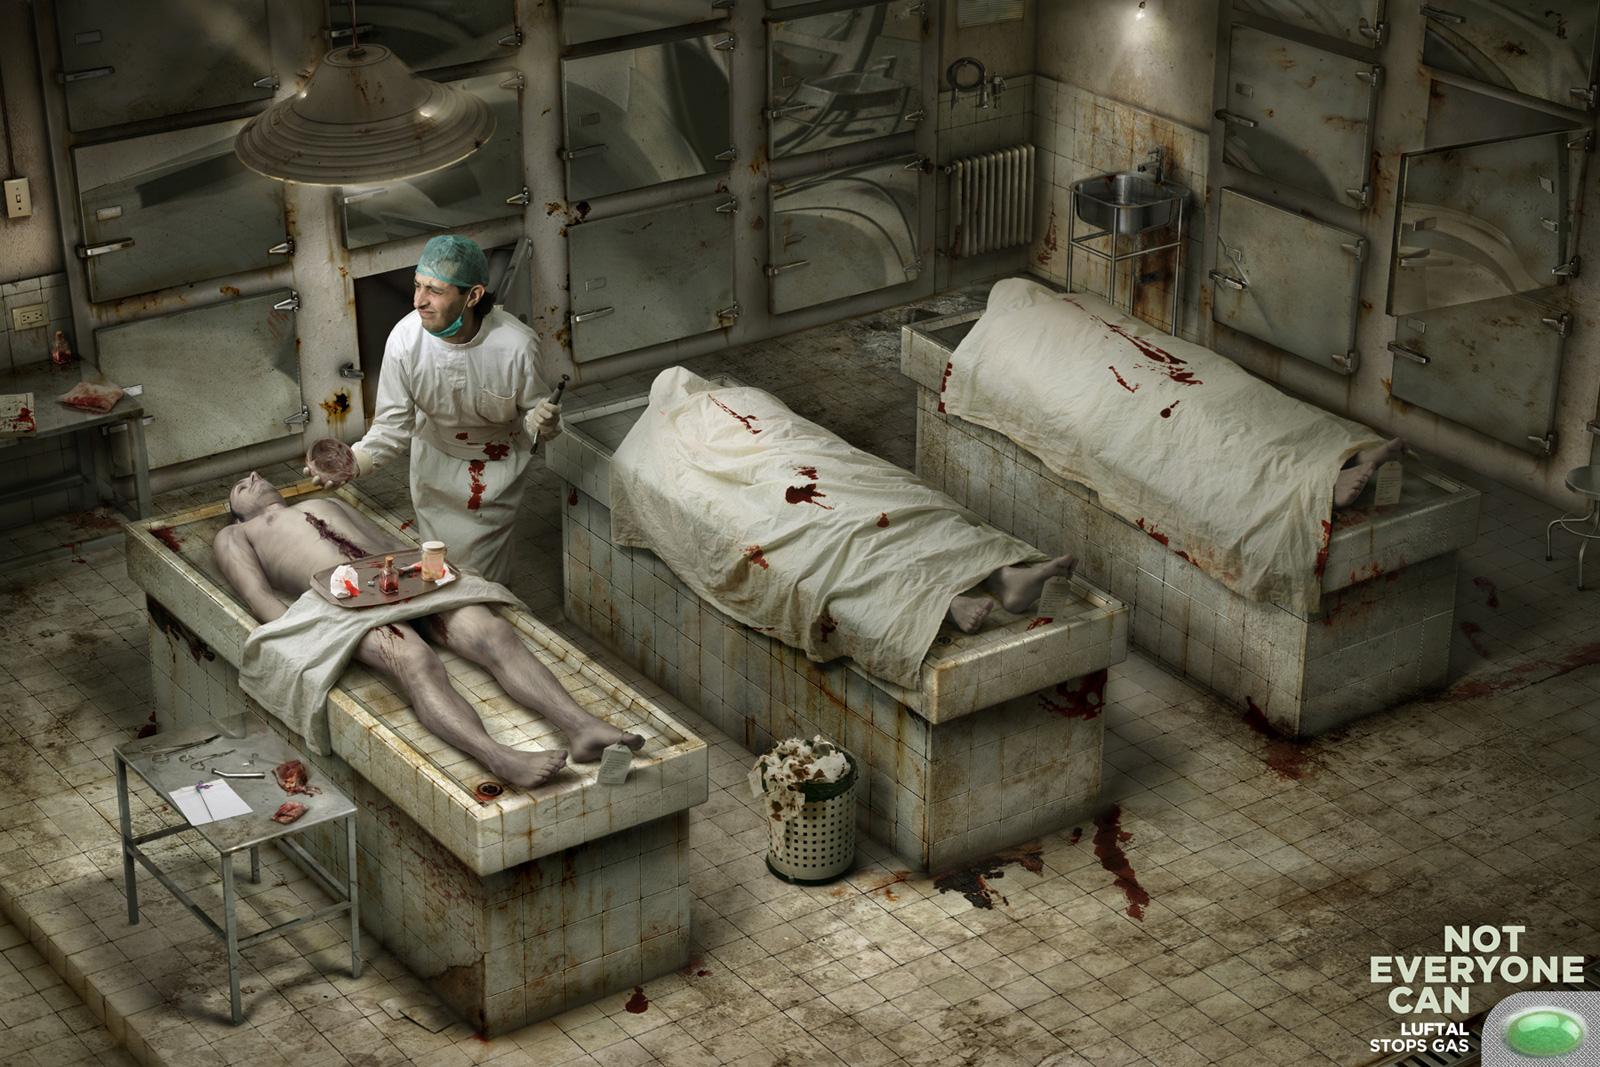 http//www.ibelieveinadv.com/commons/luftal-morgue.jpg